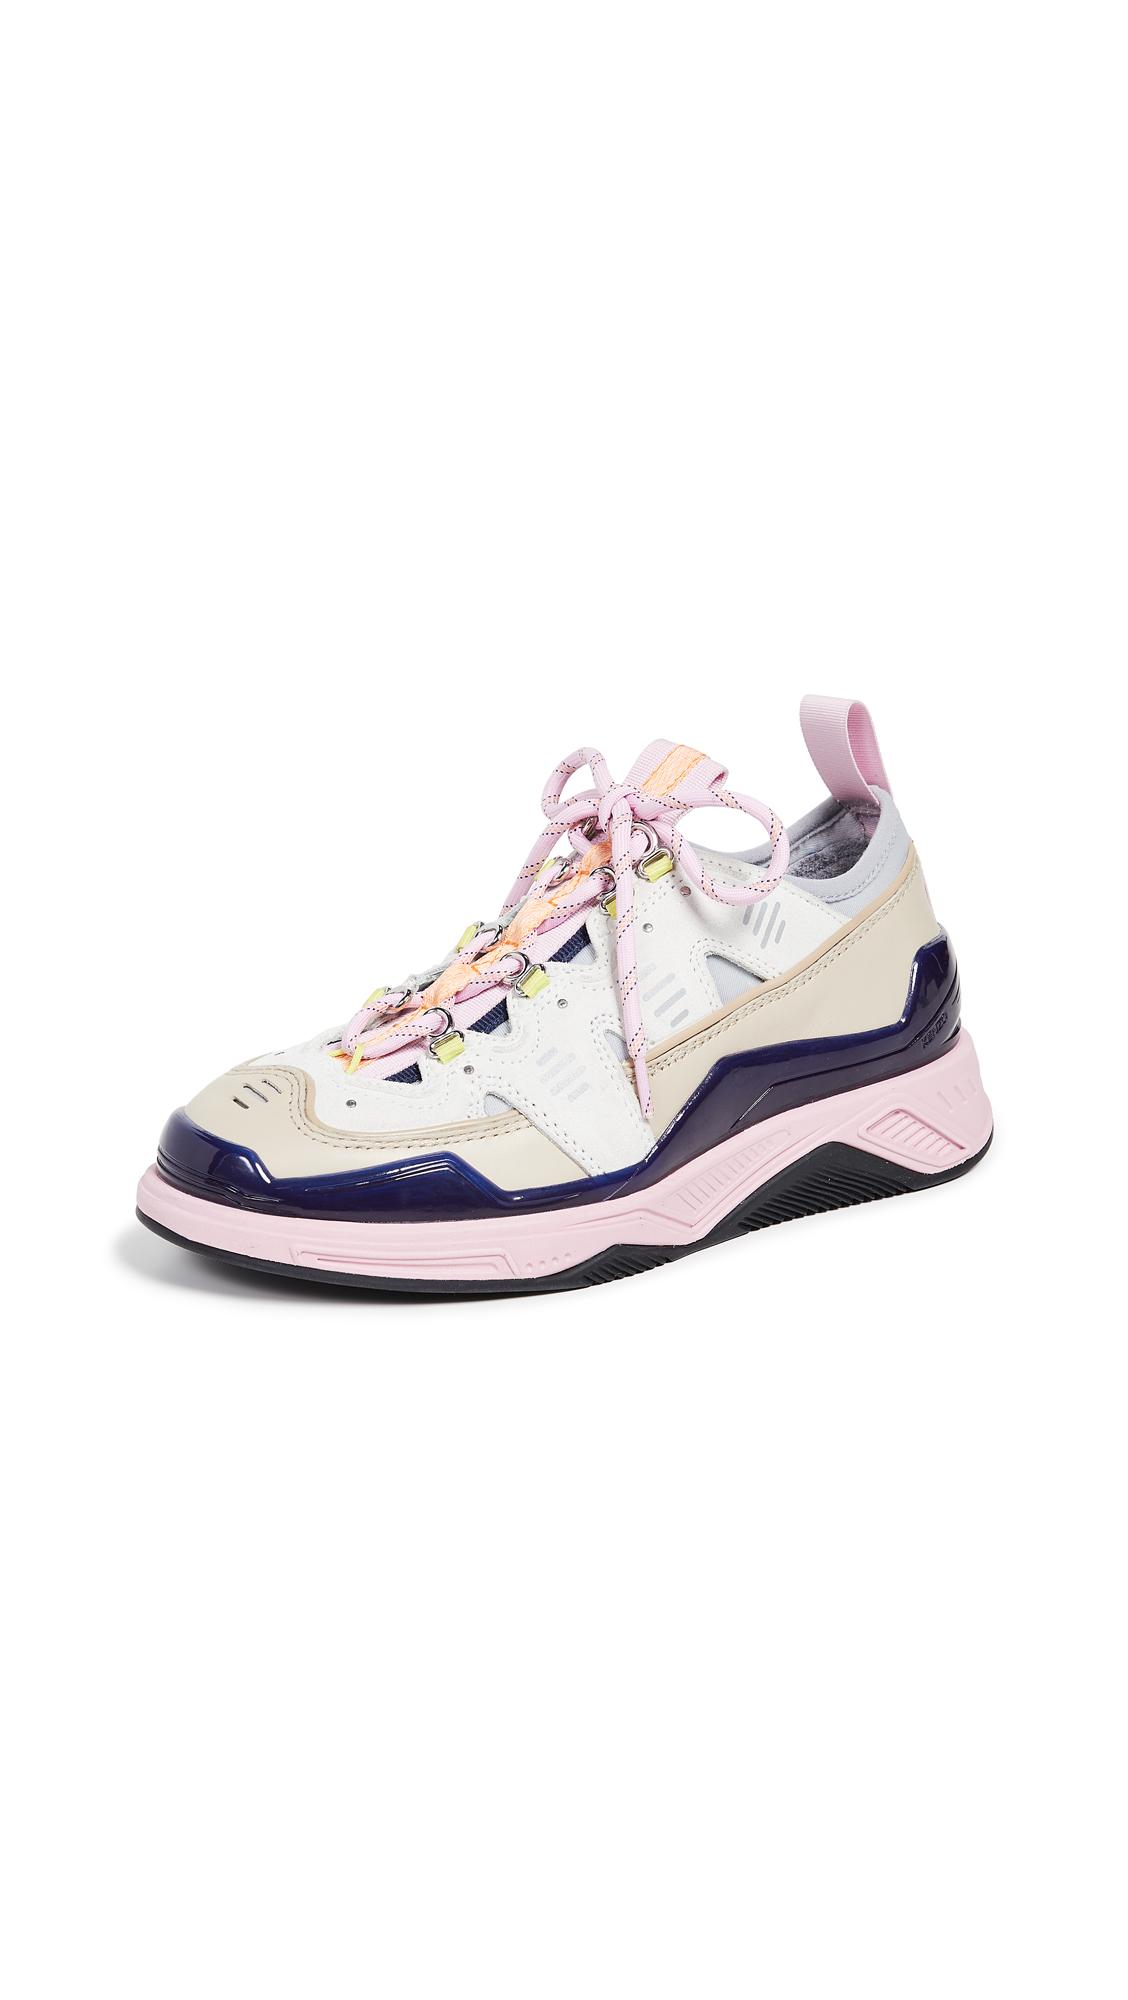 KENZO Klimb Sneakers - White